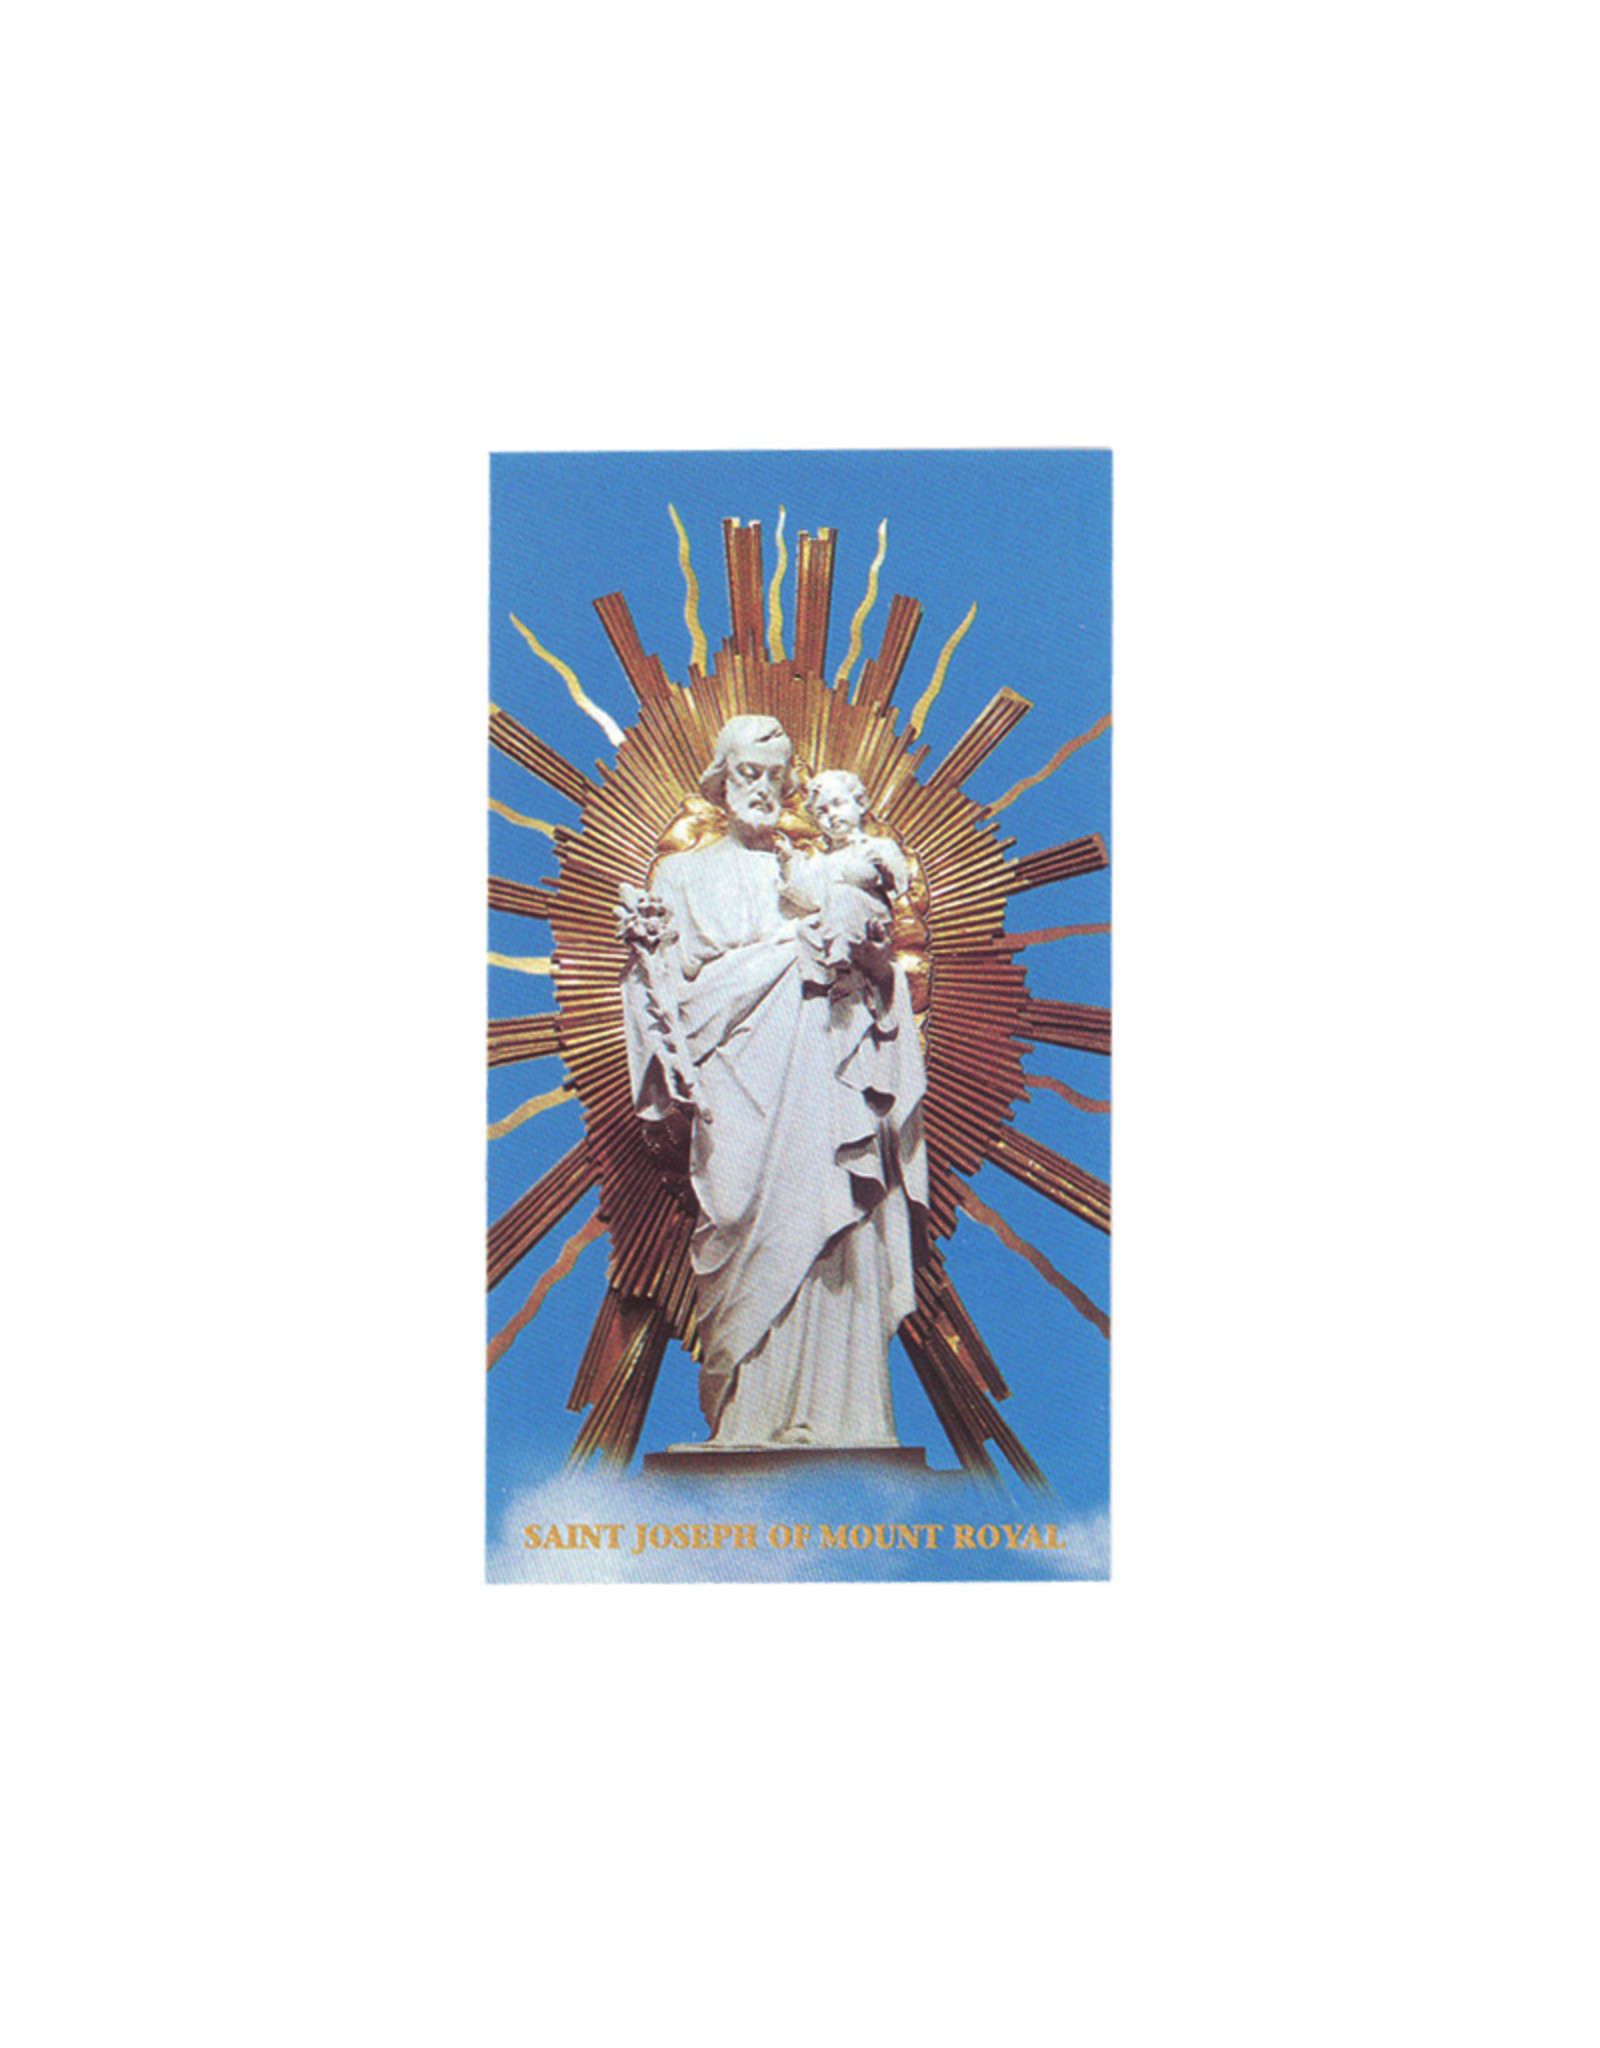 Image  with prayer, Saint Joseph of the crypt statue